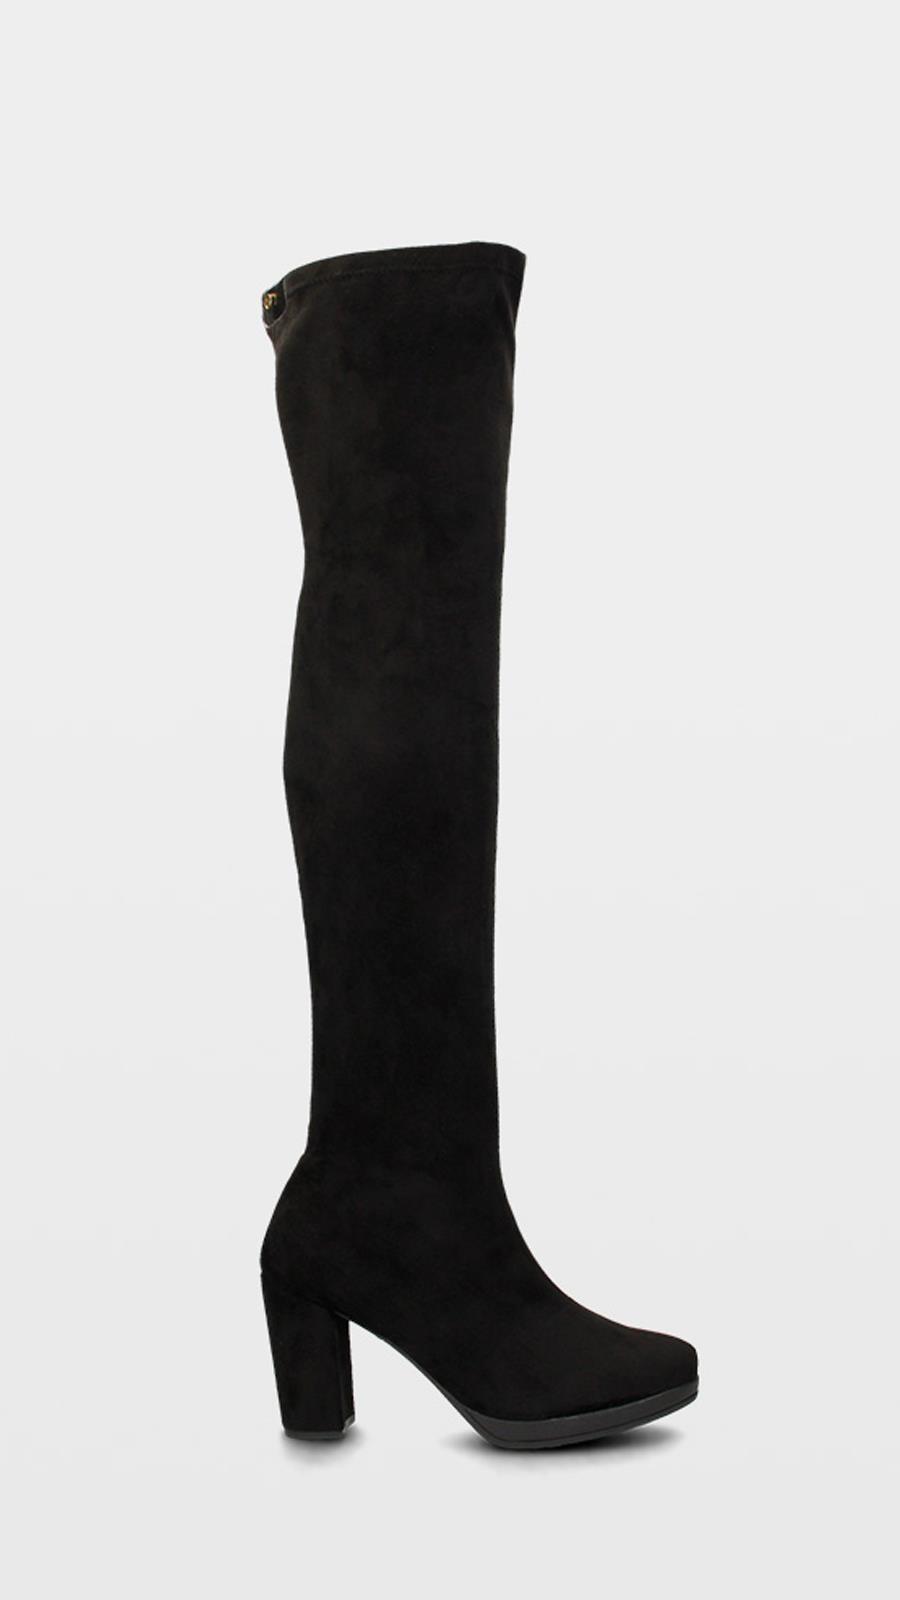 23b184a7 Olivia Palermo nos recuerda que las botas mosqueteras son tendencia ...